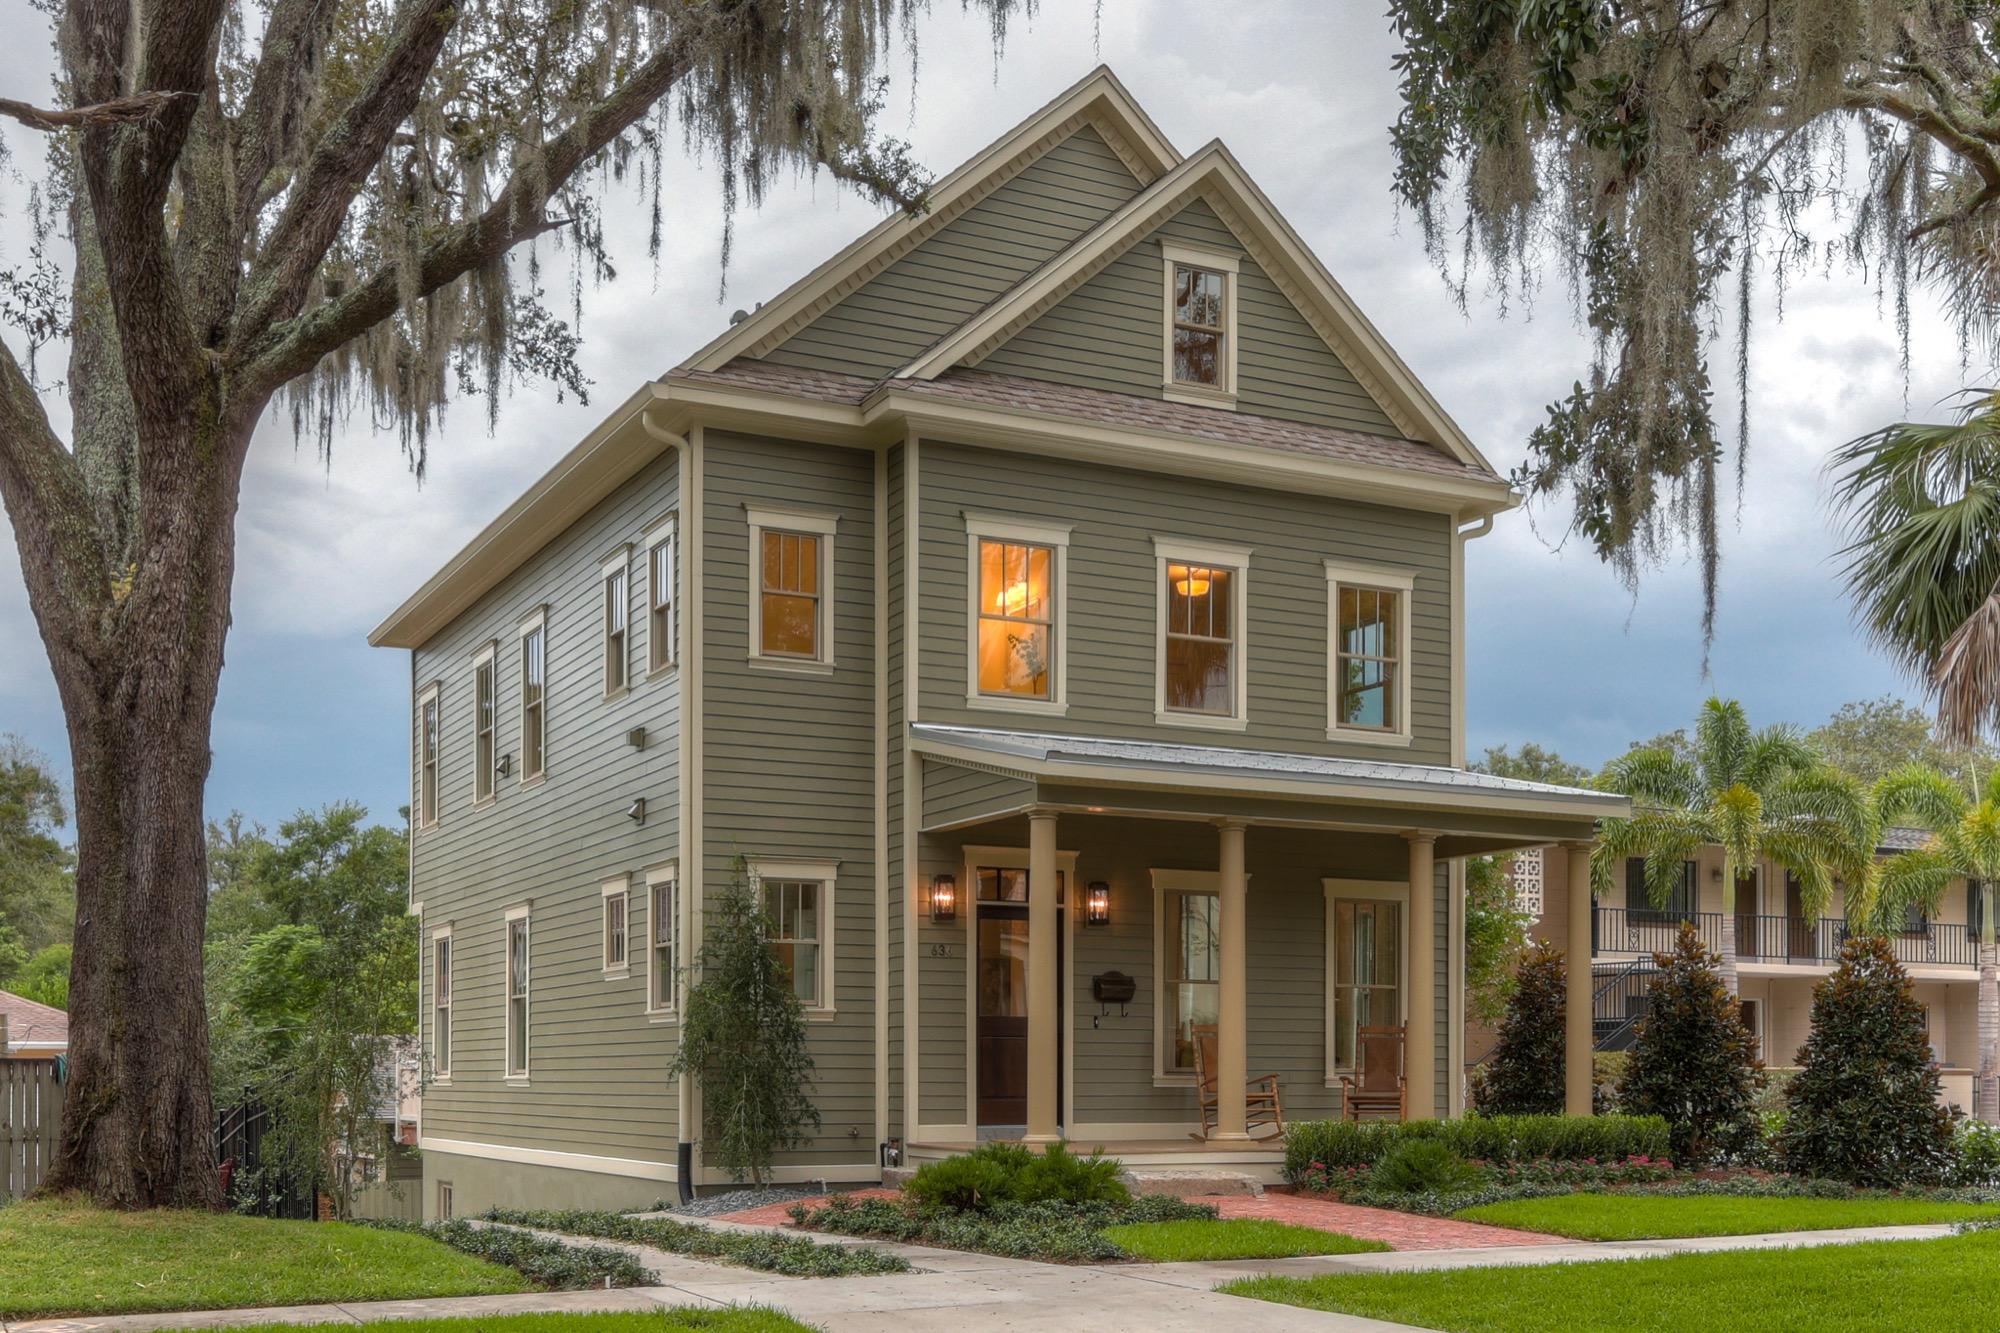 636 Hillcrest St, Orlando, FL 32803